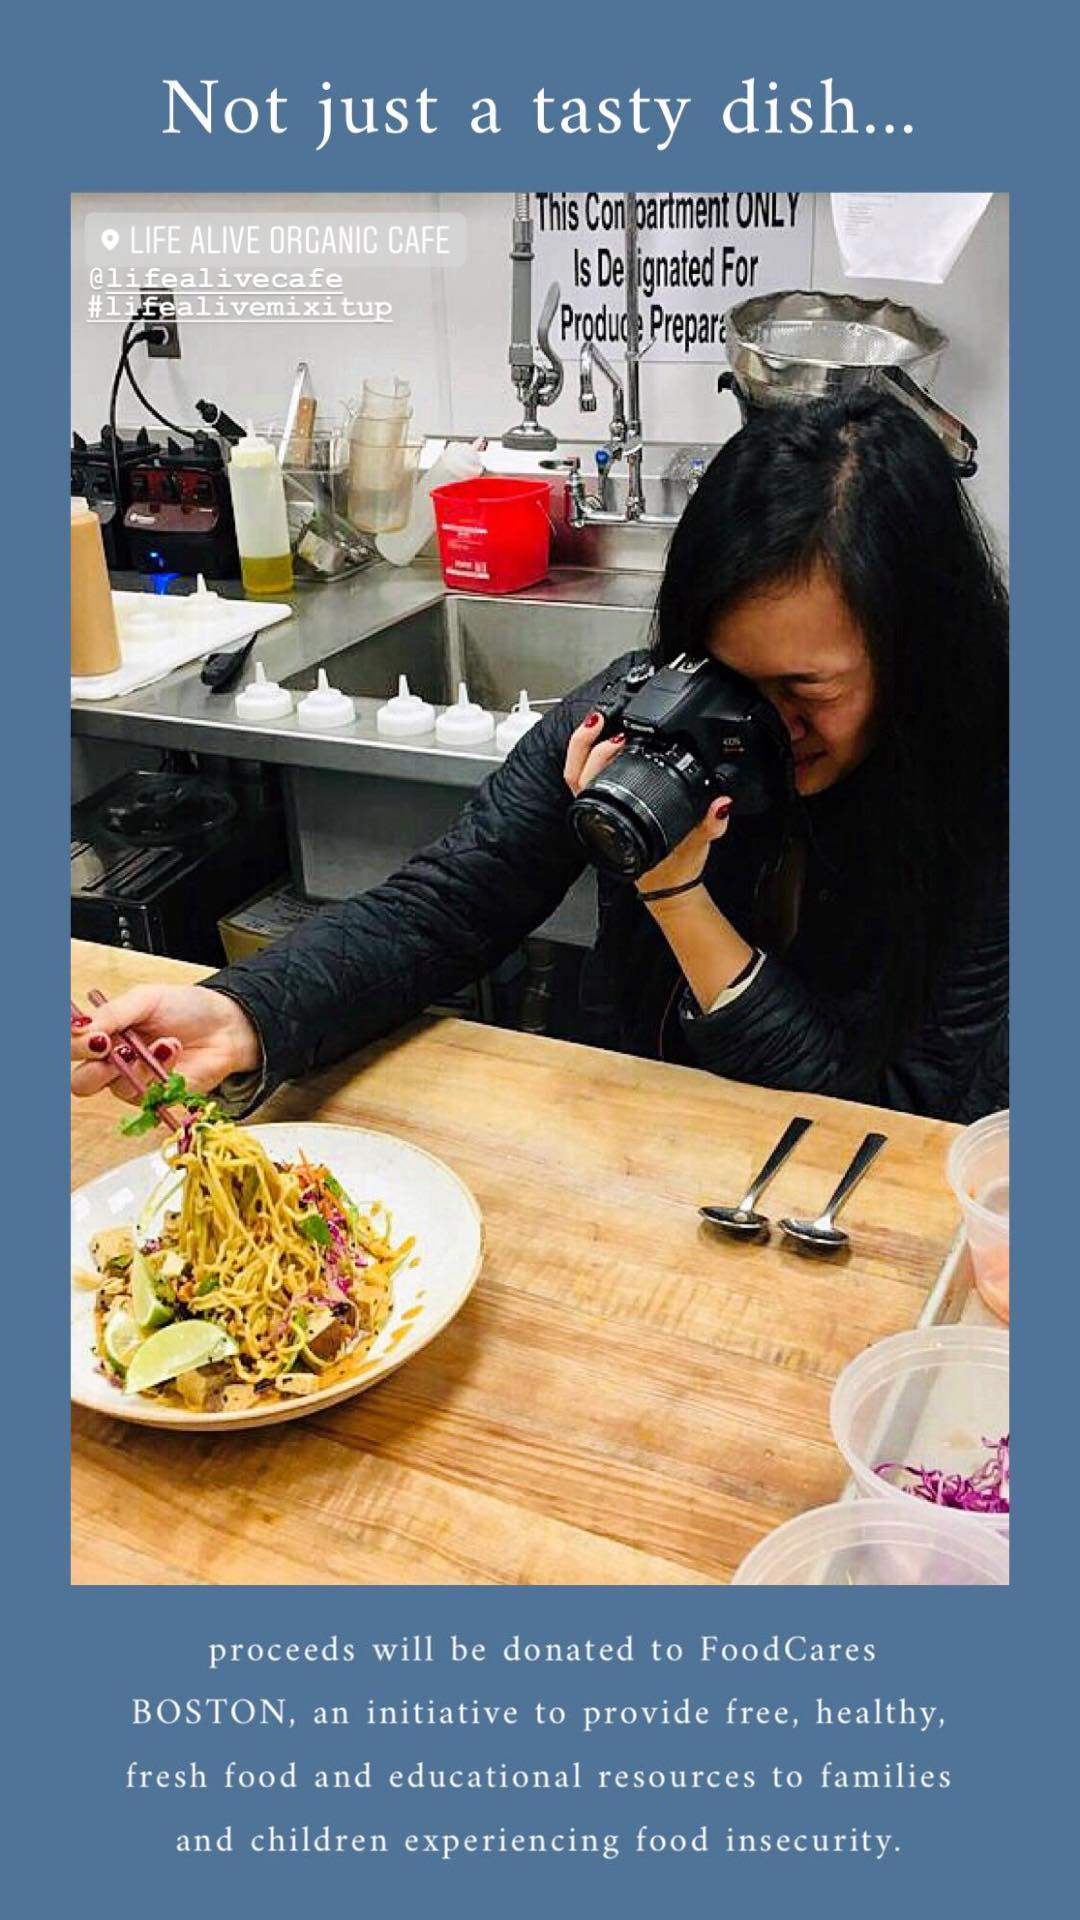 2018.10.15_bostonfoodgram, Instagram Story_Life Alive Brookline03_edited.jpg